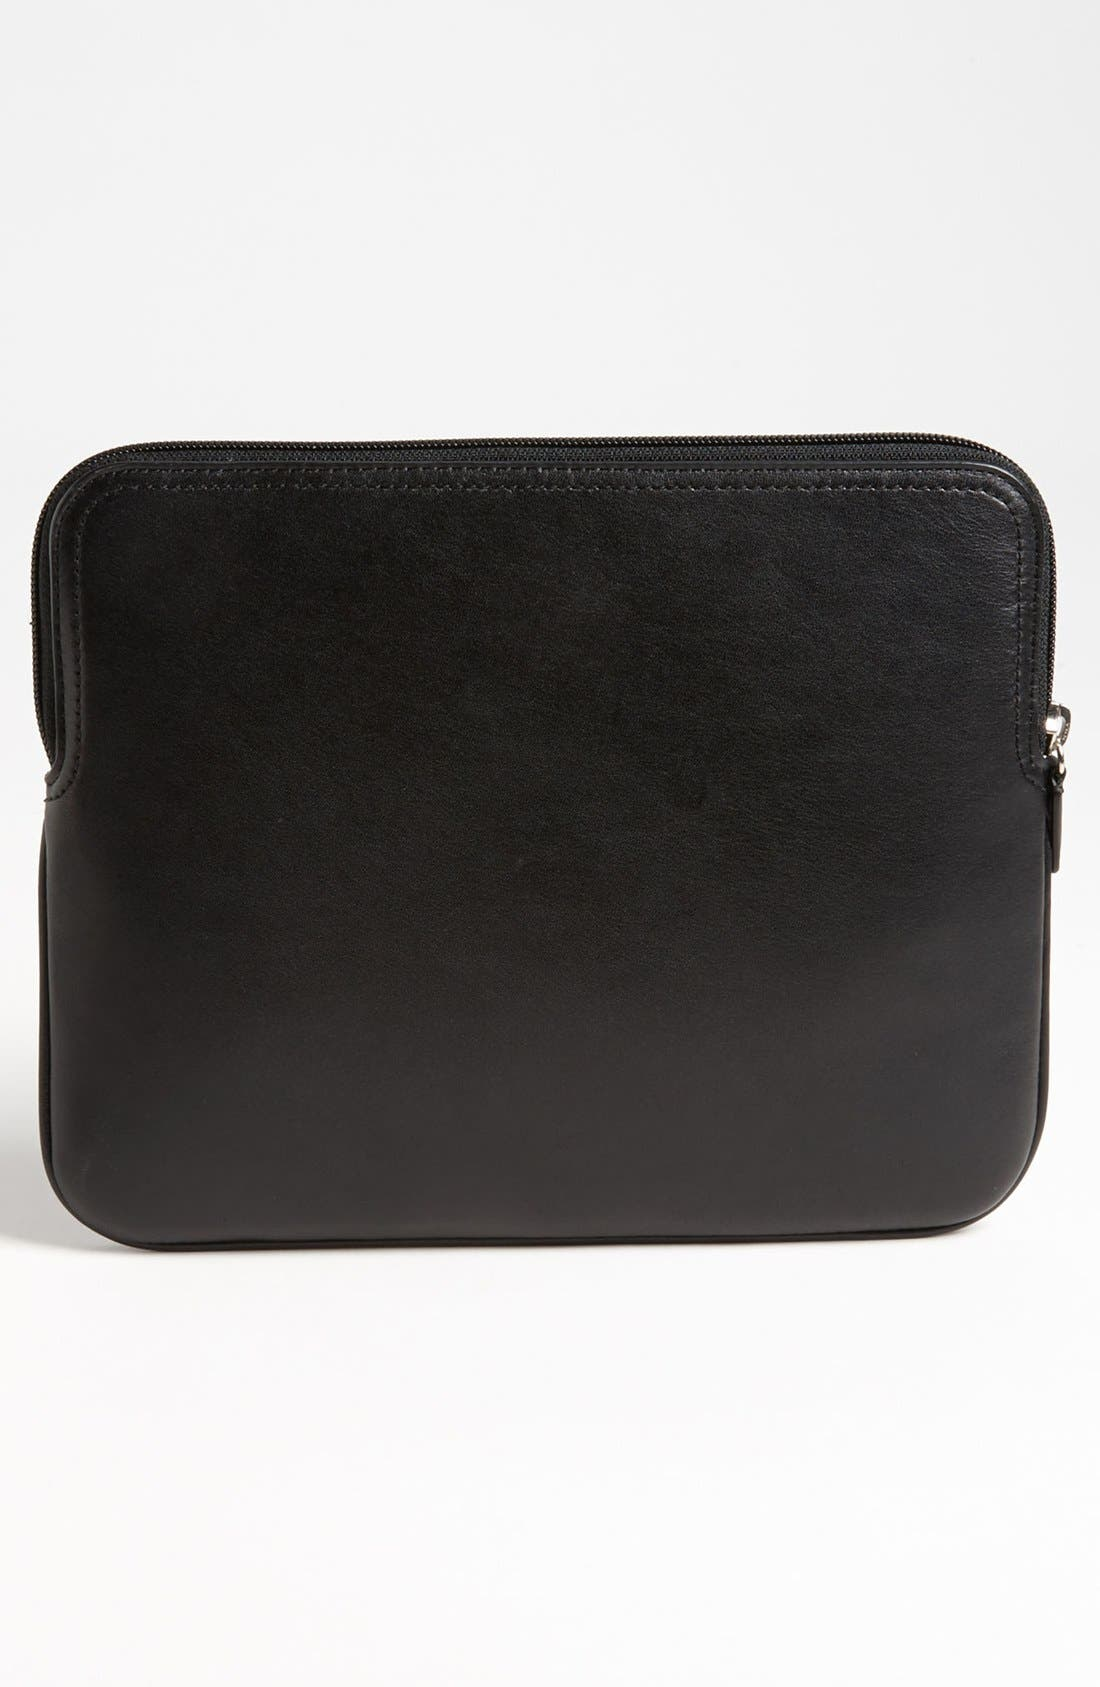 Alternate Image 3  - COACH Leather iPad 2 & 3 Sleeve